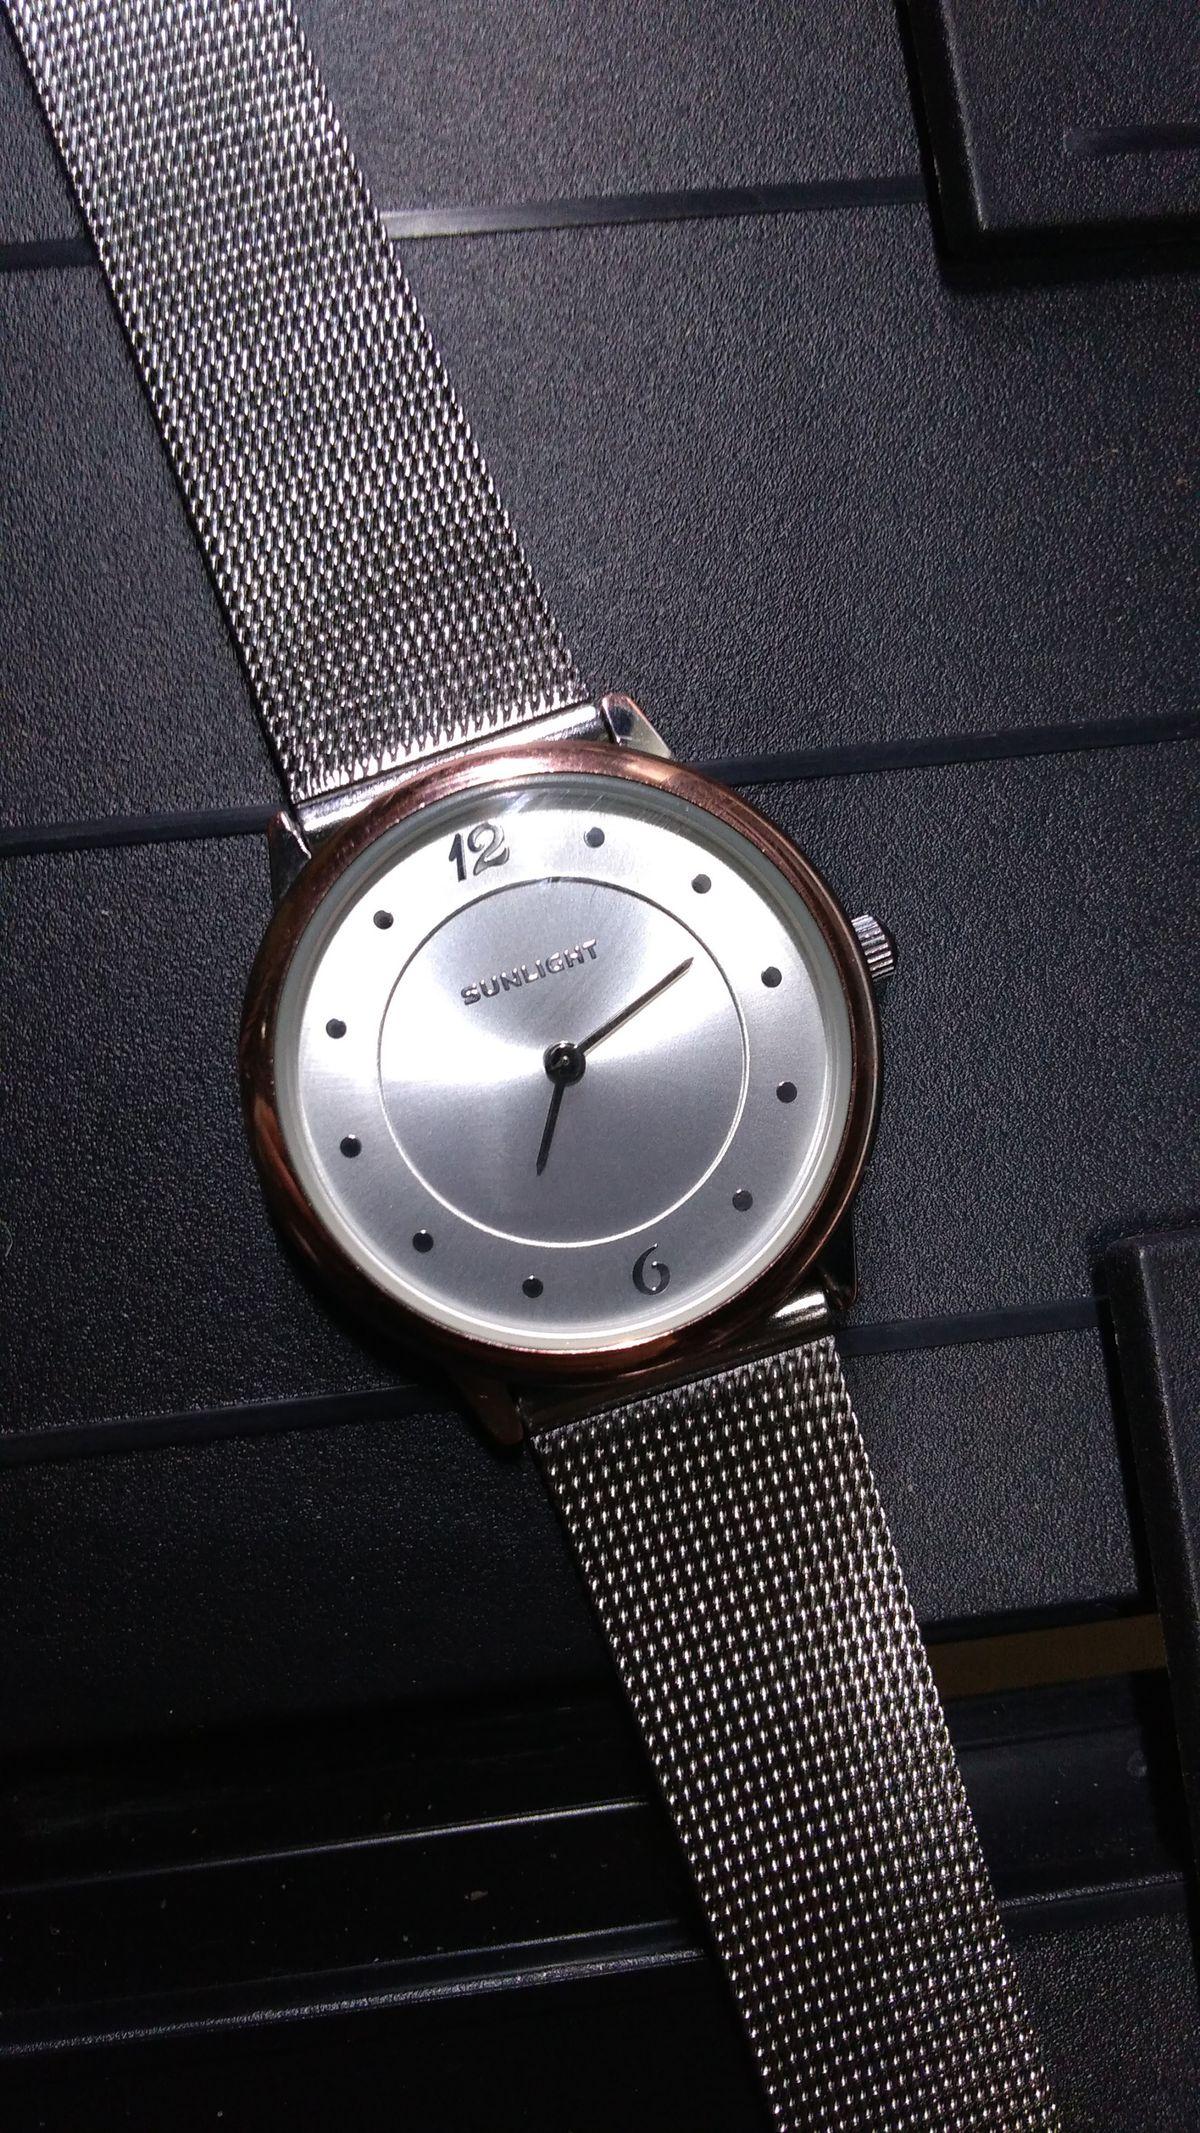 Обычные часы